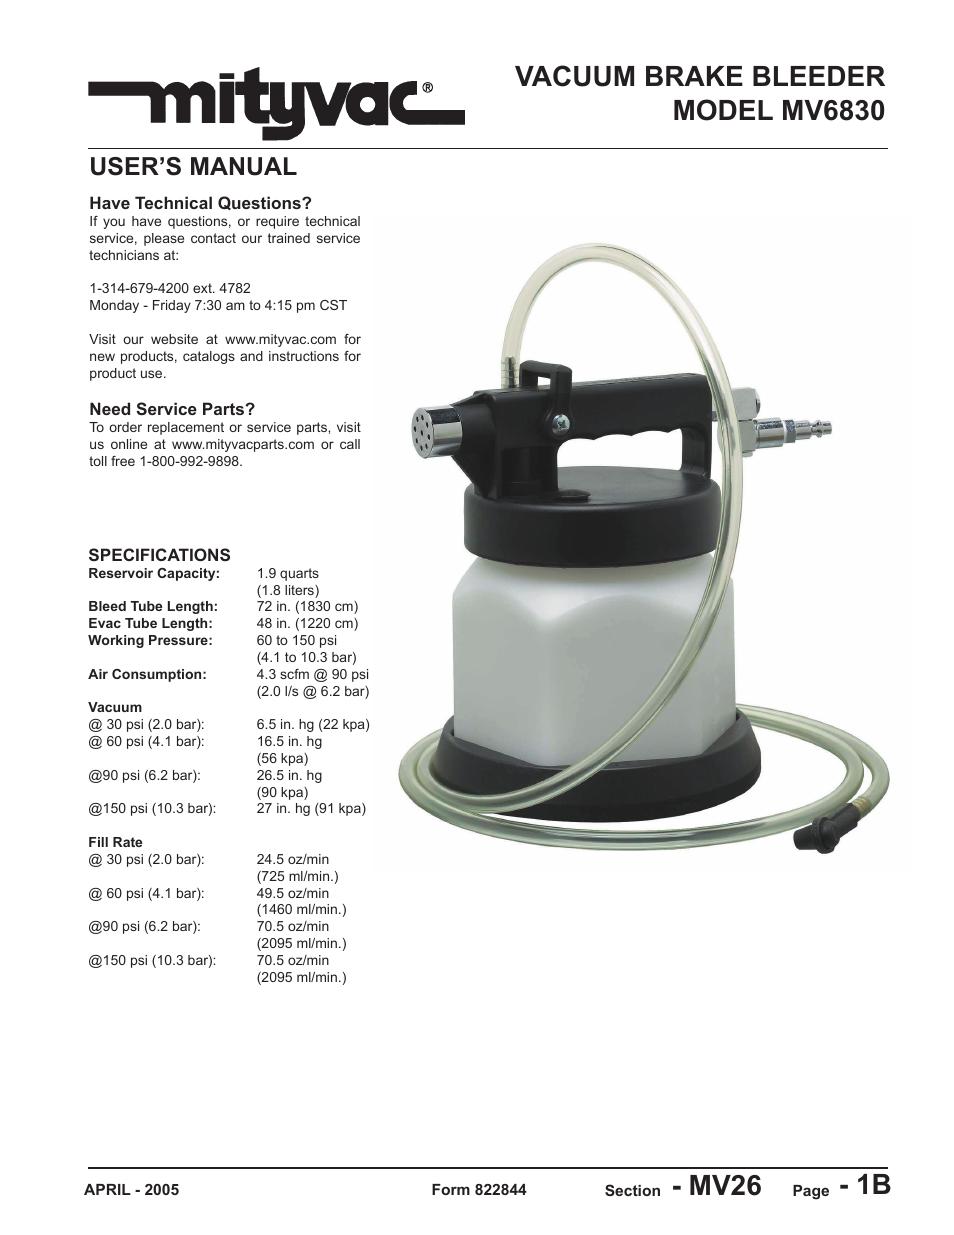 Mityvac Mv6830 Vacuum Brake Bleeder User Manual 24 Pages